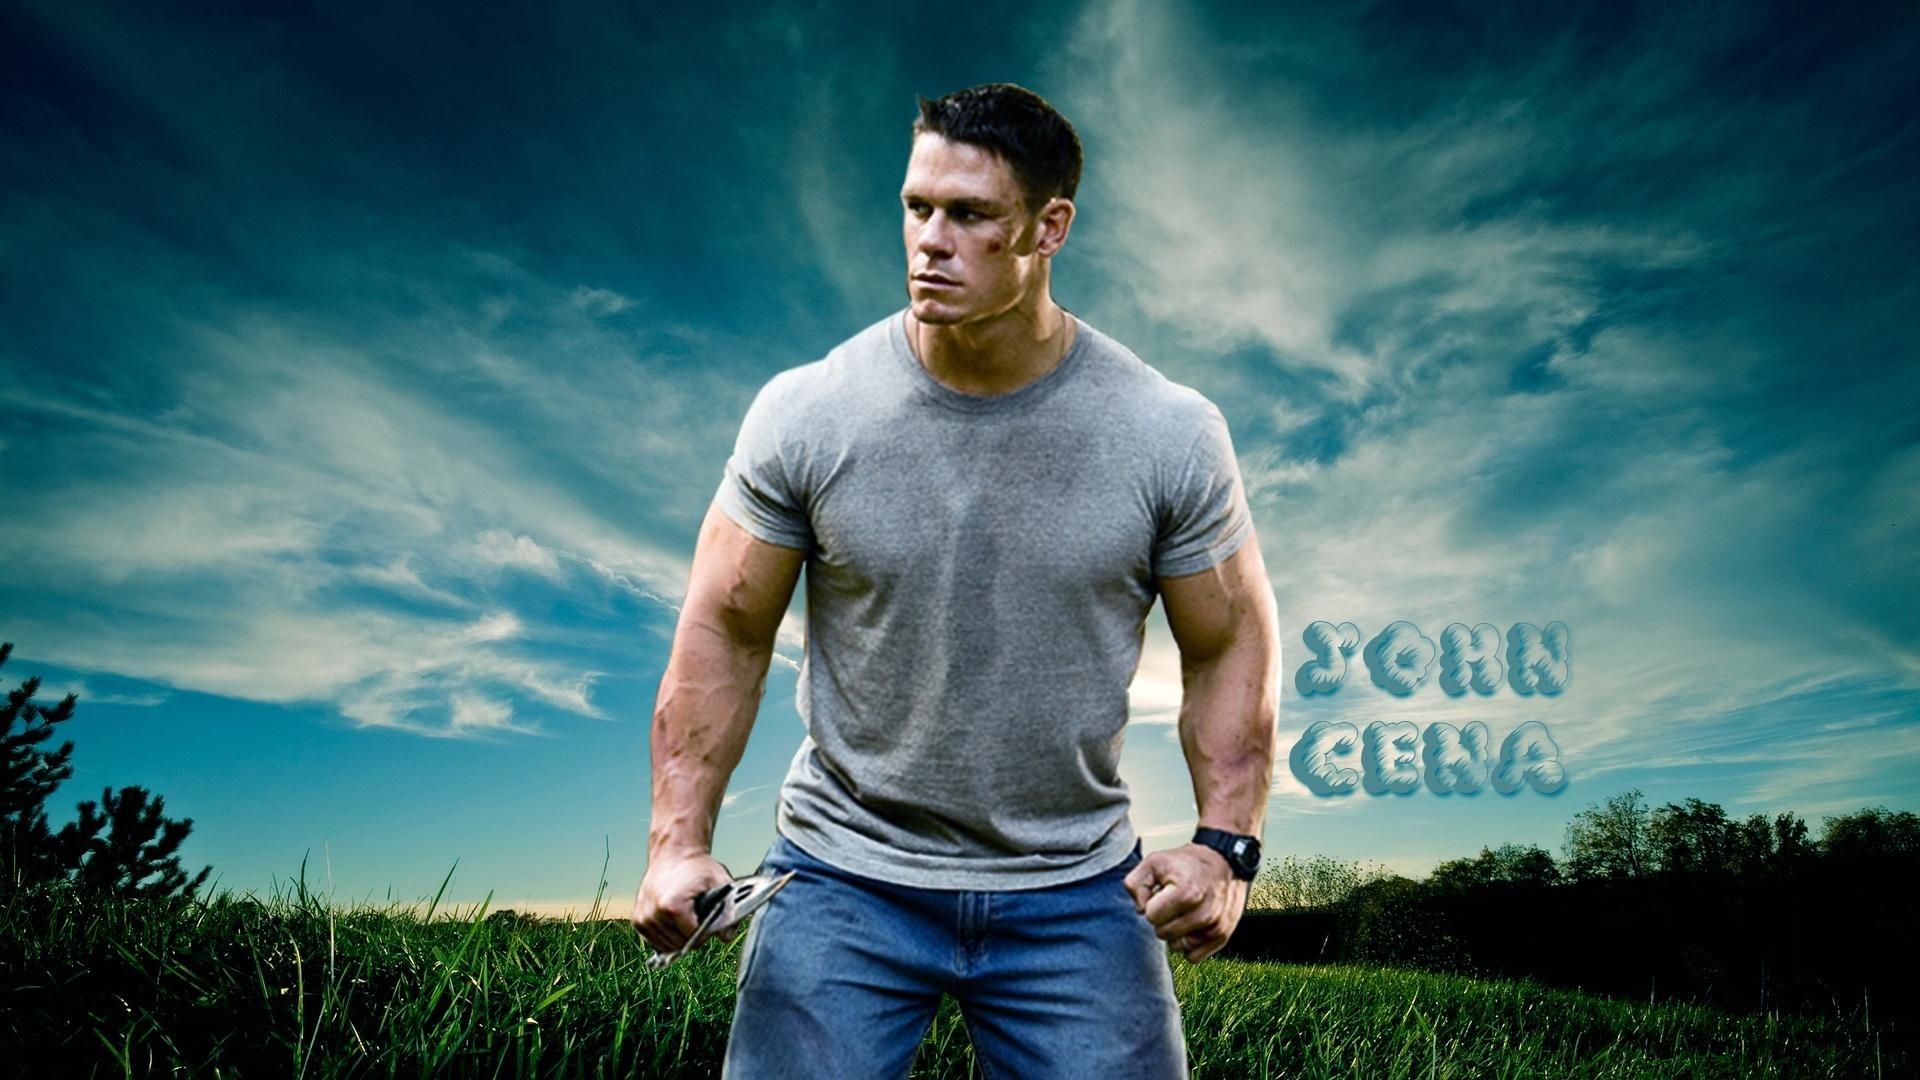 WWE John Cena Wallpapers 2016 HD for free download